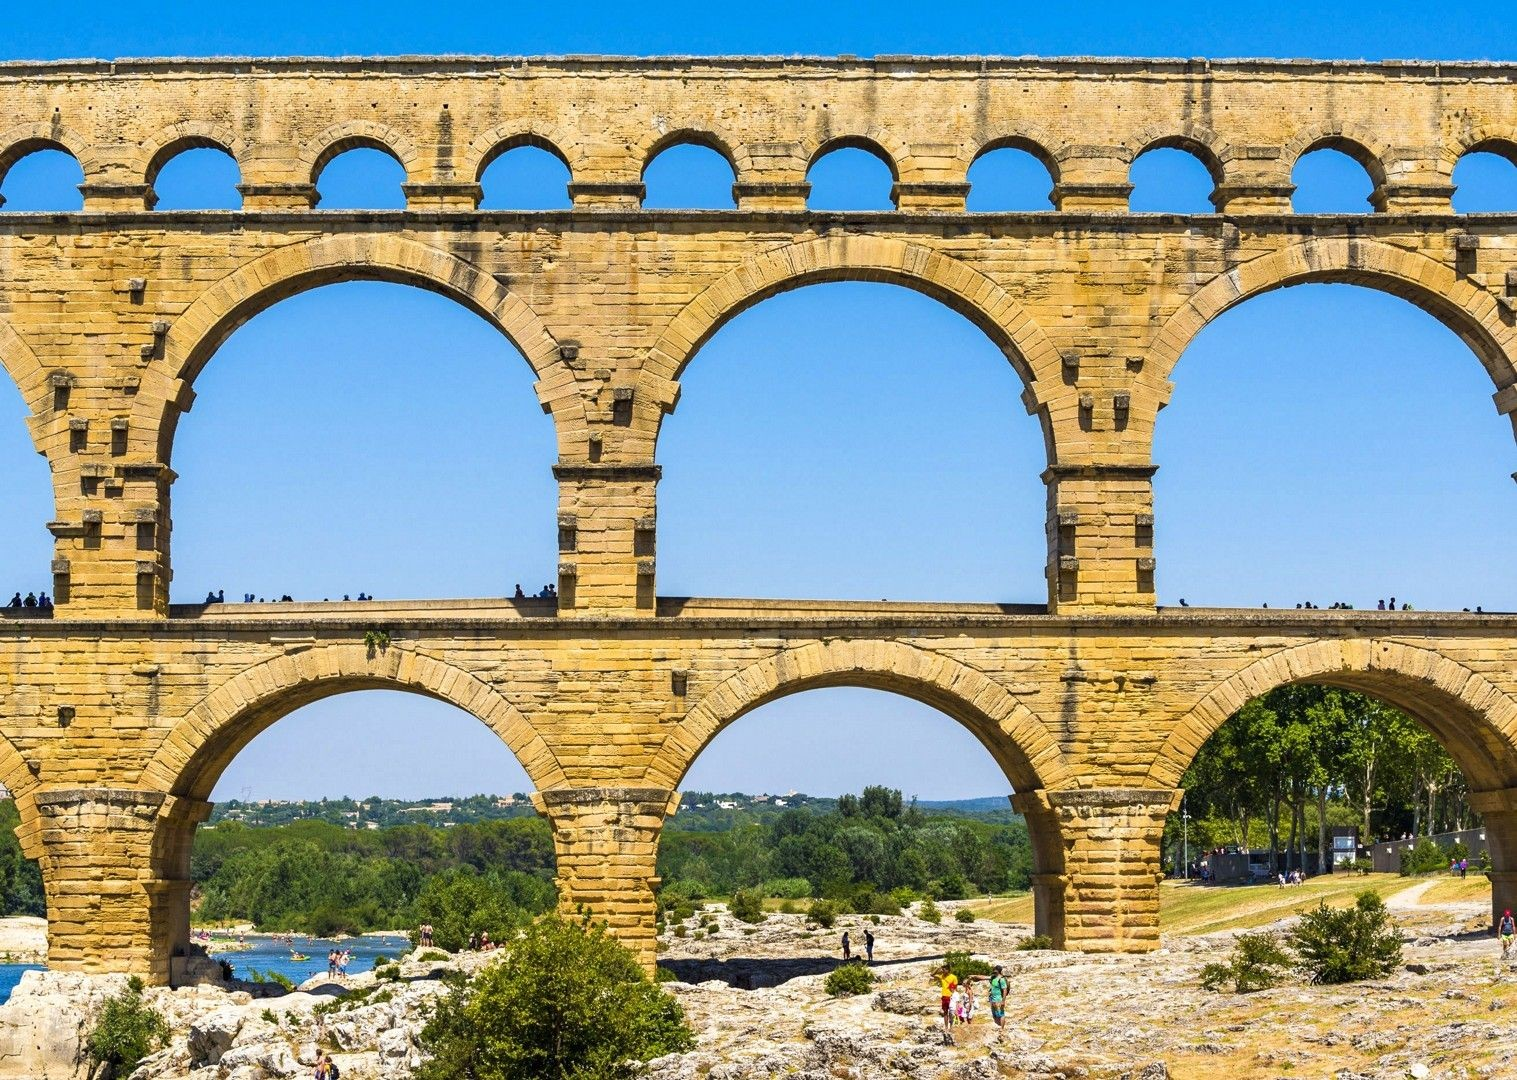 vers-pont-du-gard-france-cycling-holiday-saddle-skedaddle-cultural-fun.jpg - France - Provence - Self-Guided Leisure Cycling Holiday - Leisure Cycling